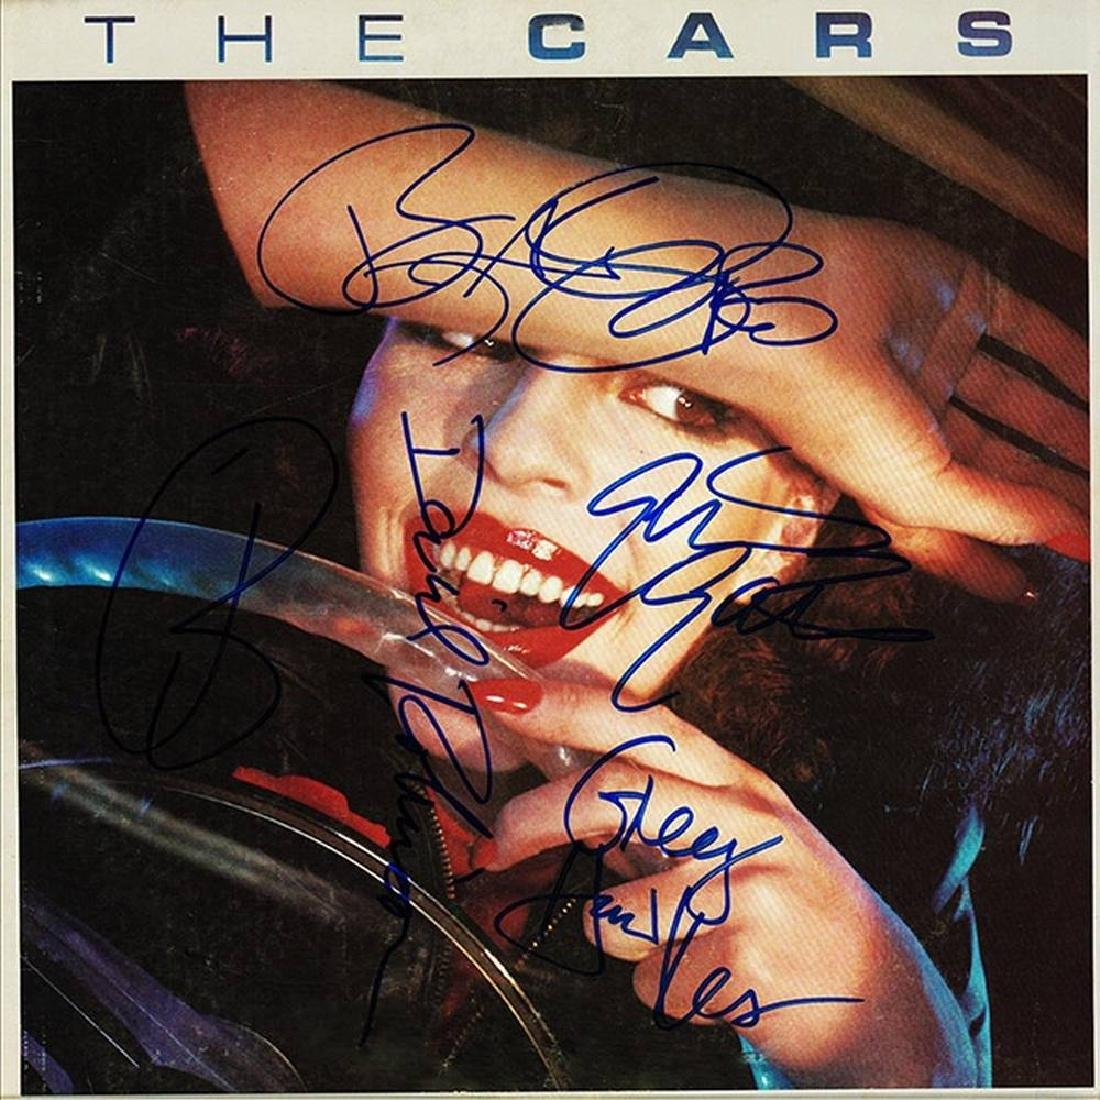 "The Cars ""The Cars"" Album"